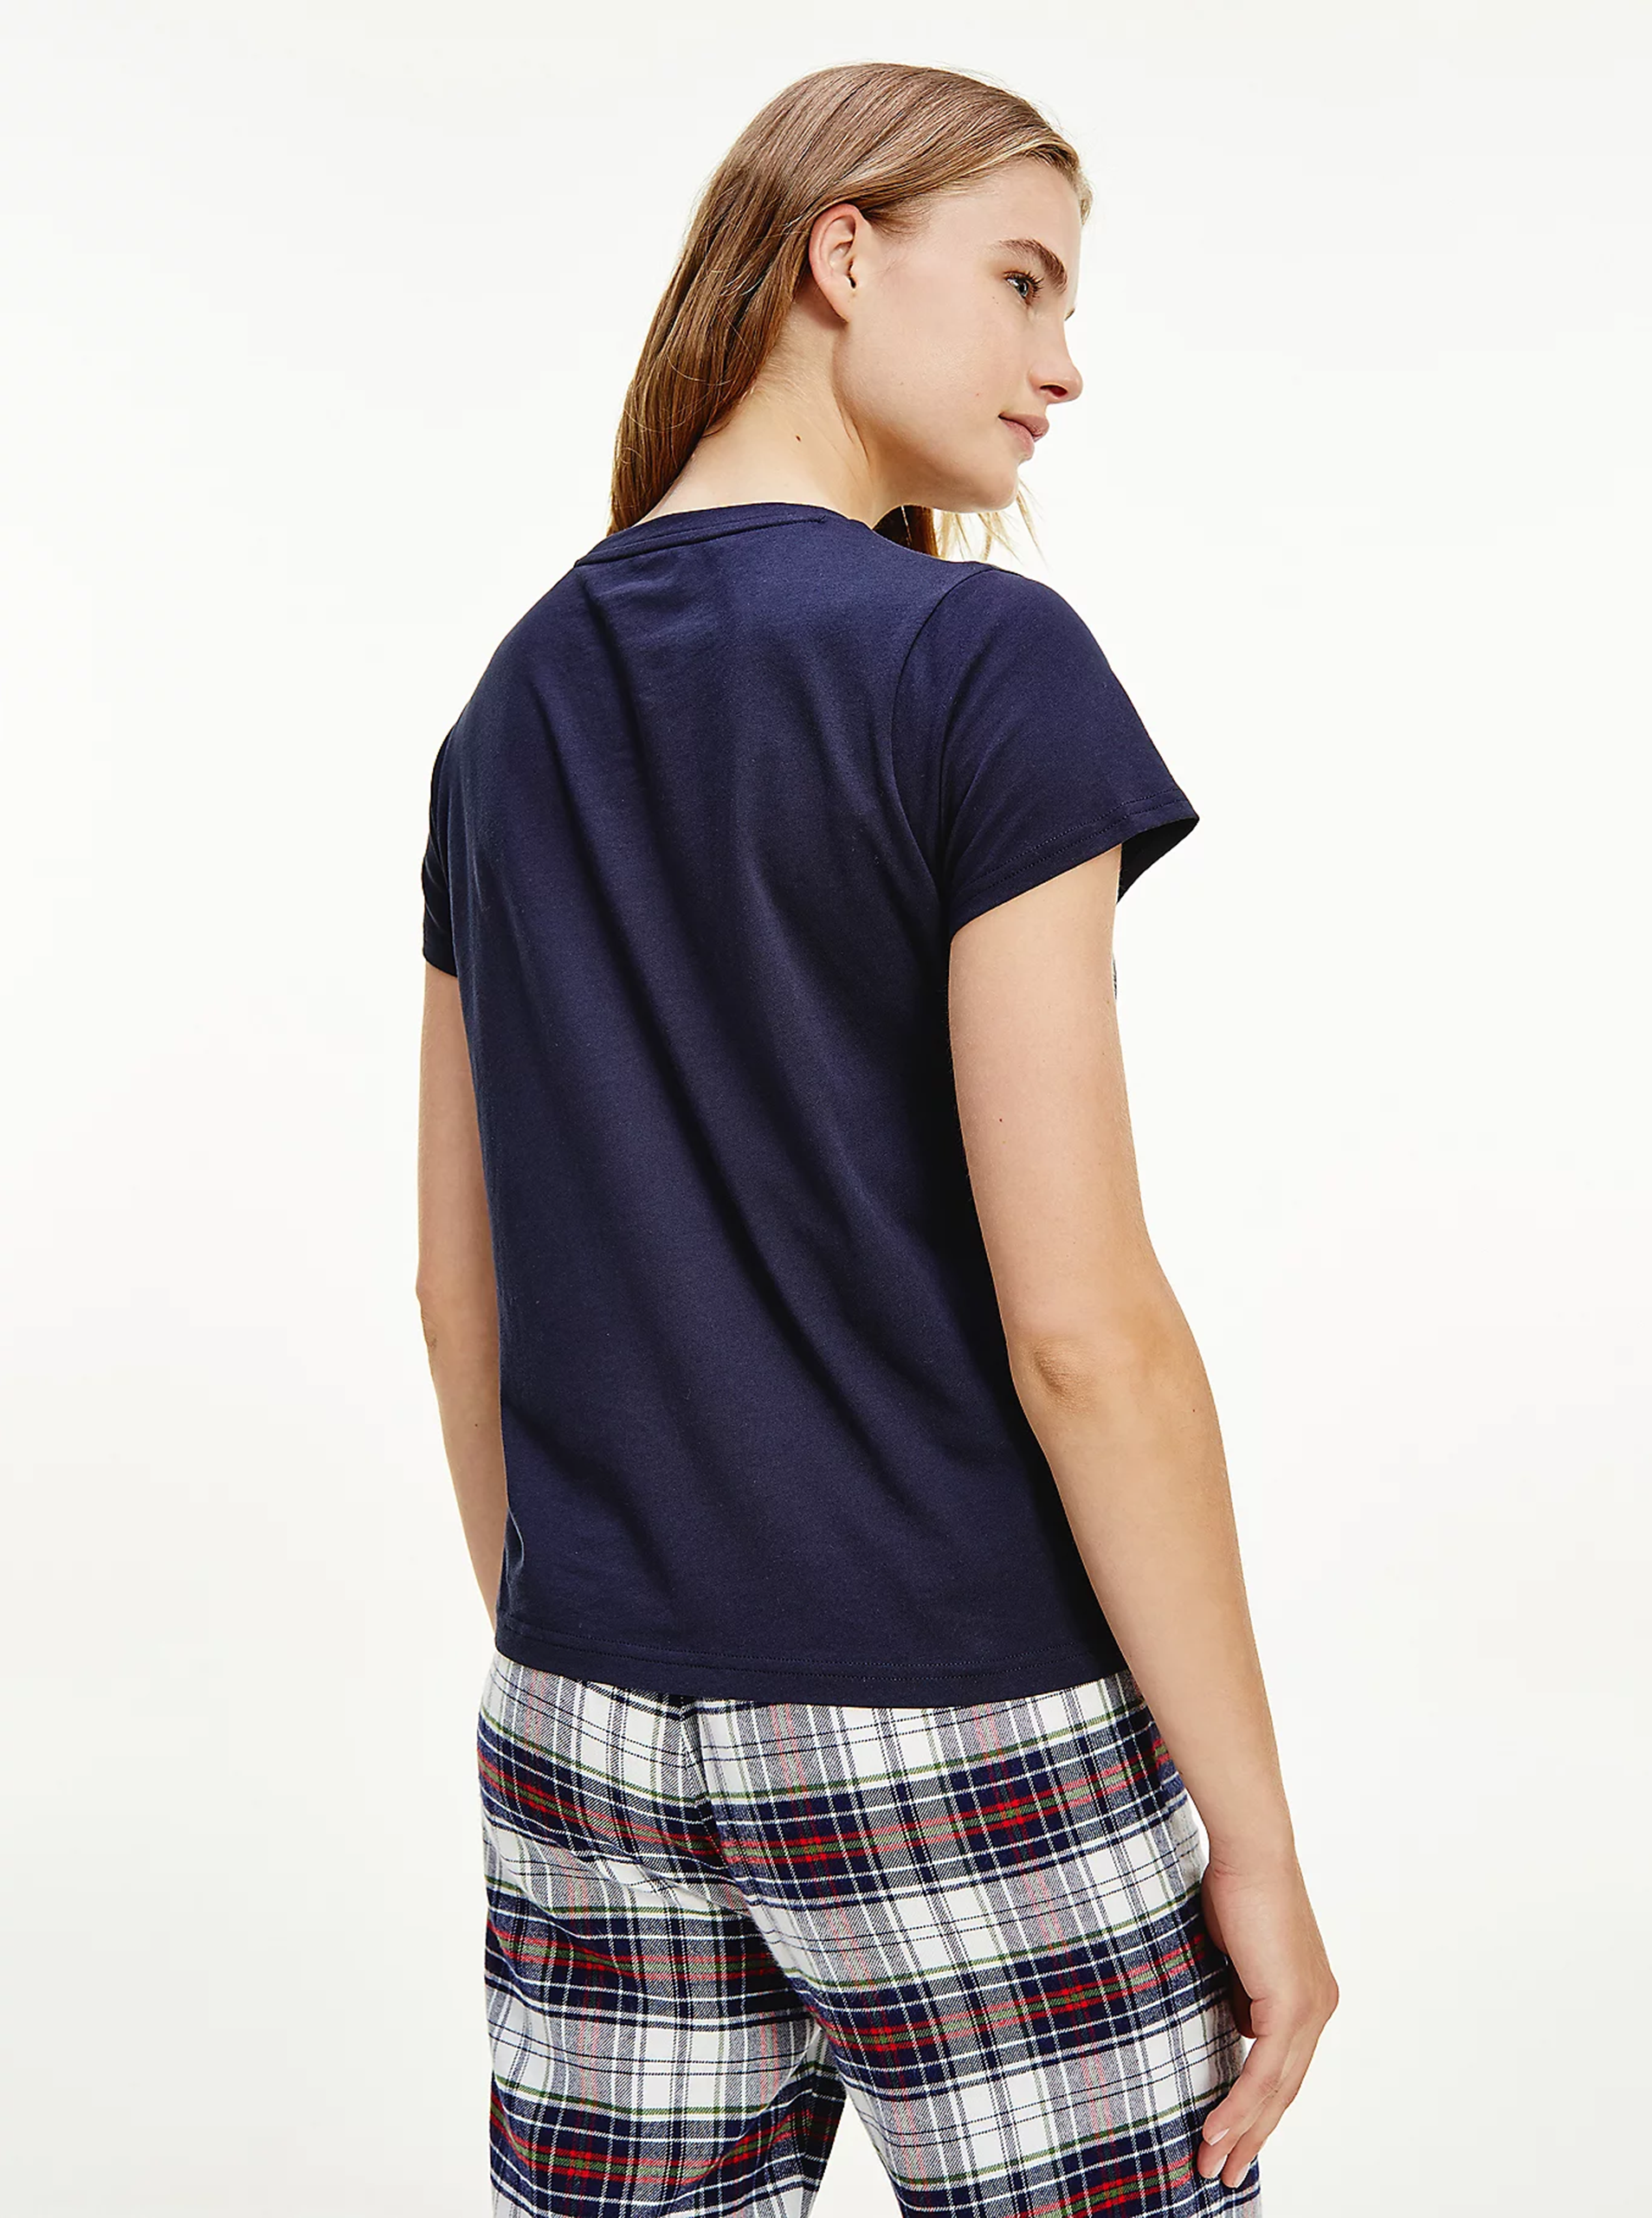 Tommy Hilfiger blu da donna maglietta